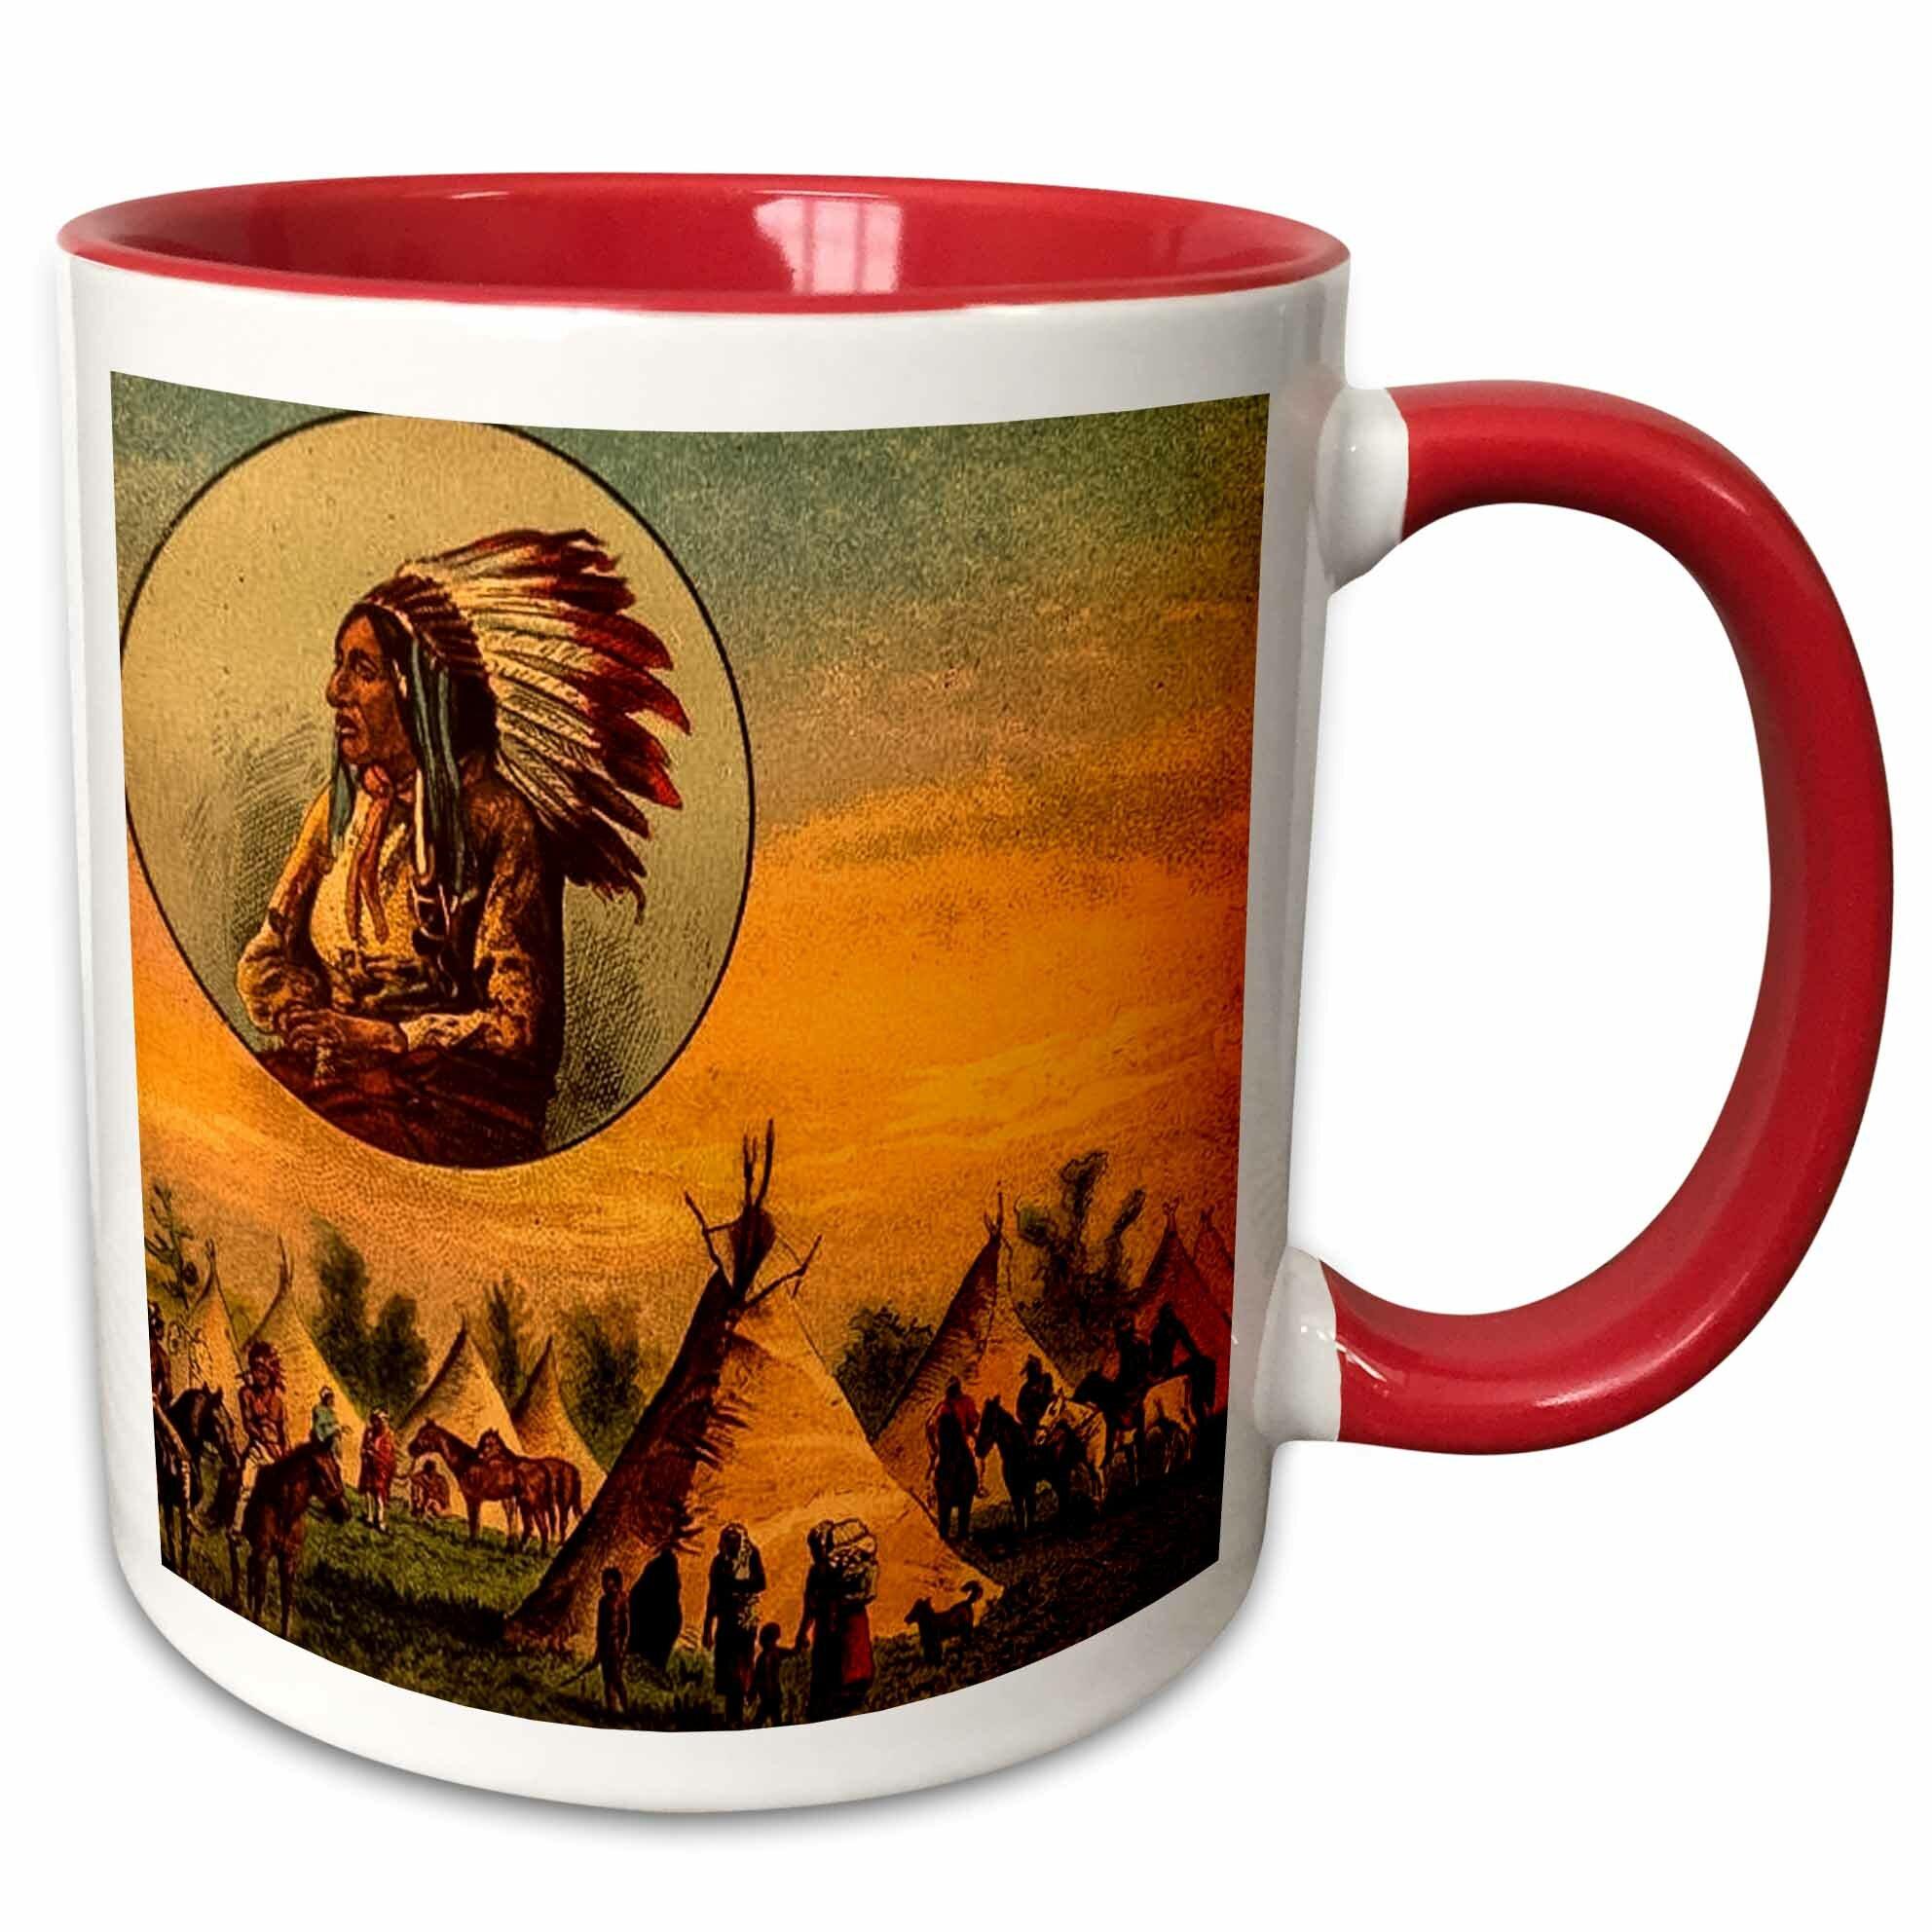 3drose Illustration Of Native American Coffee Mug Wayfair